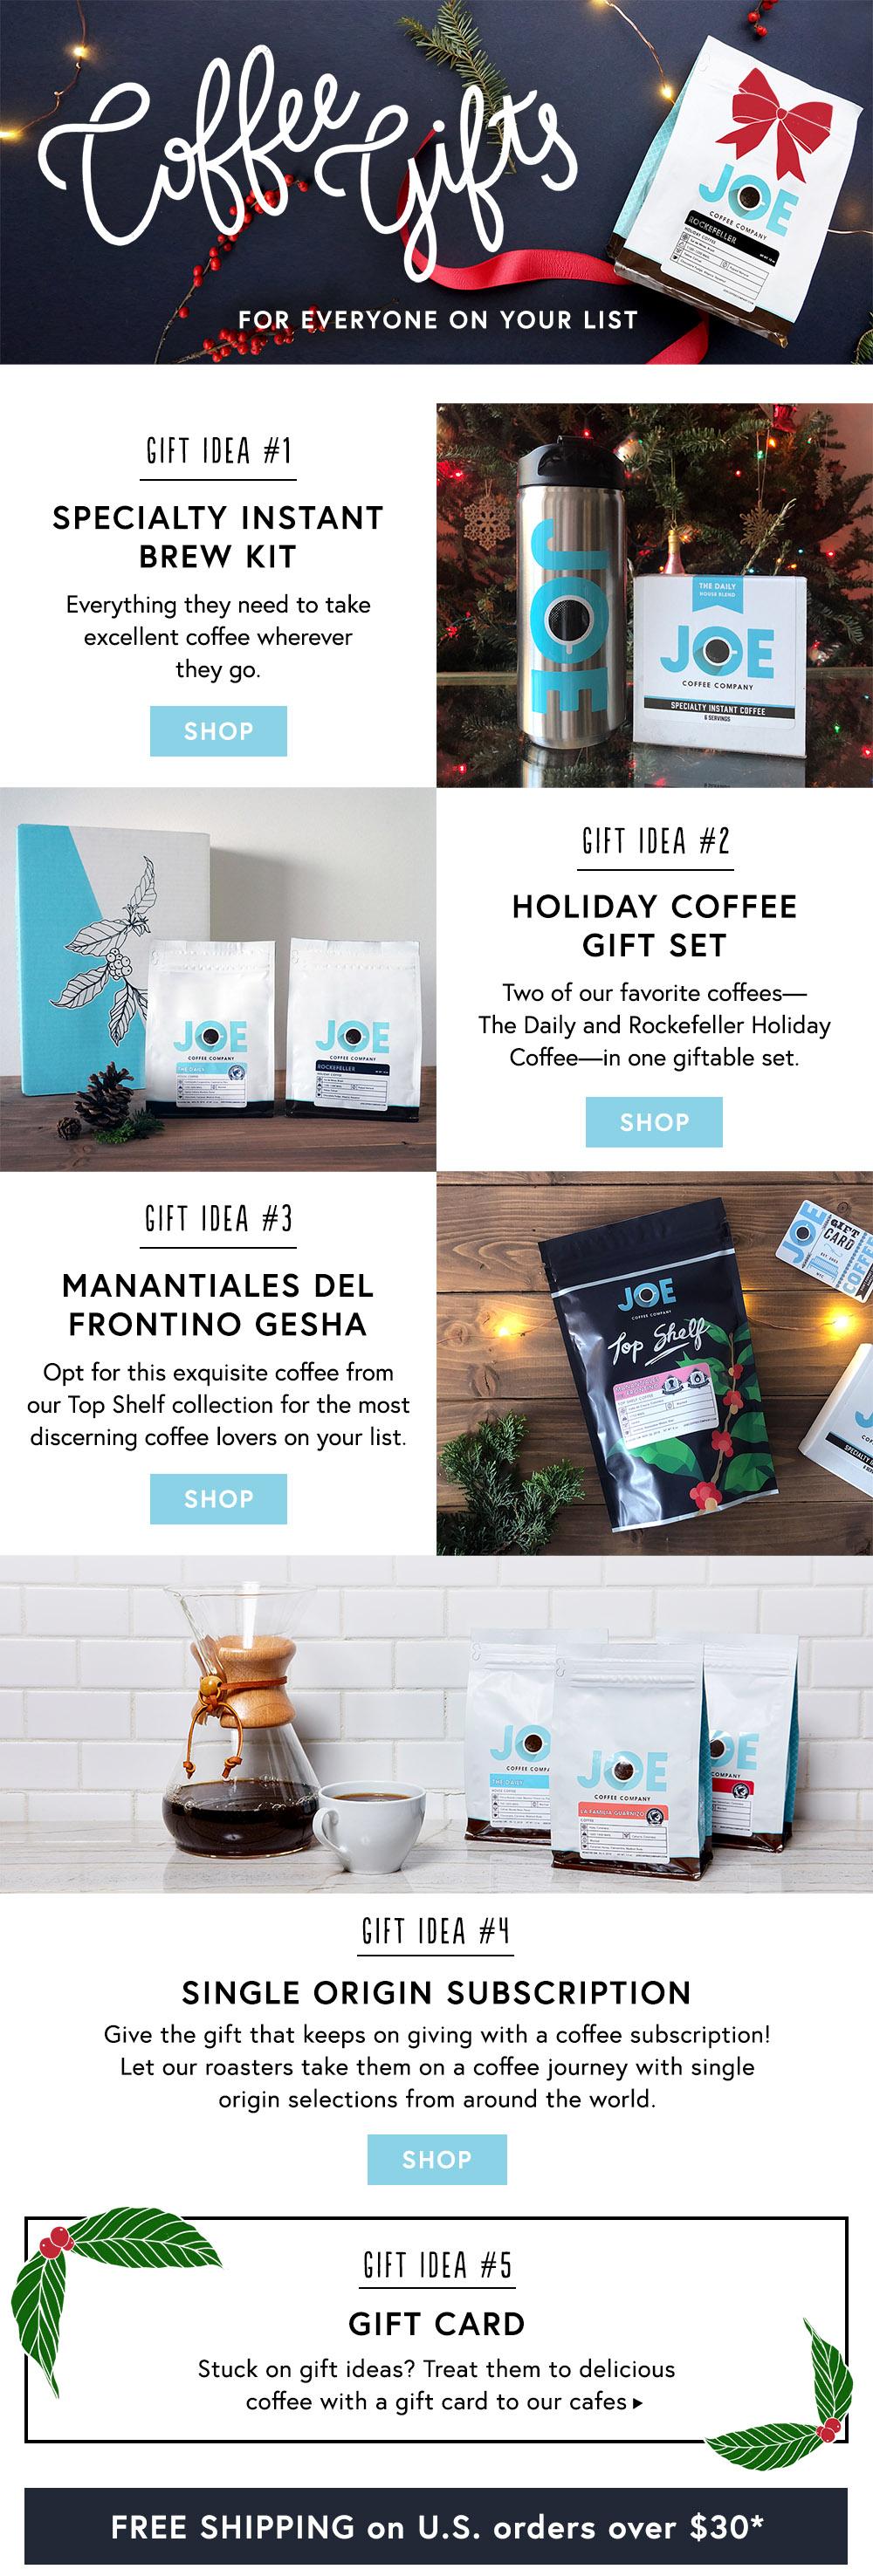 Joe Holiday Gift Guide Final - website.jpg